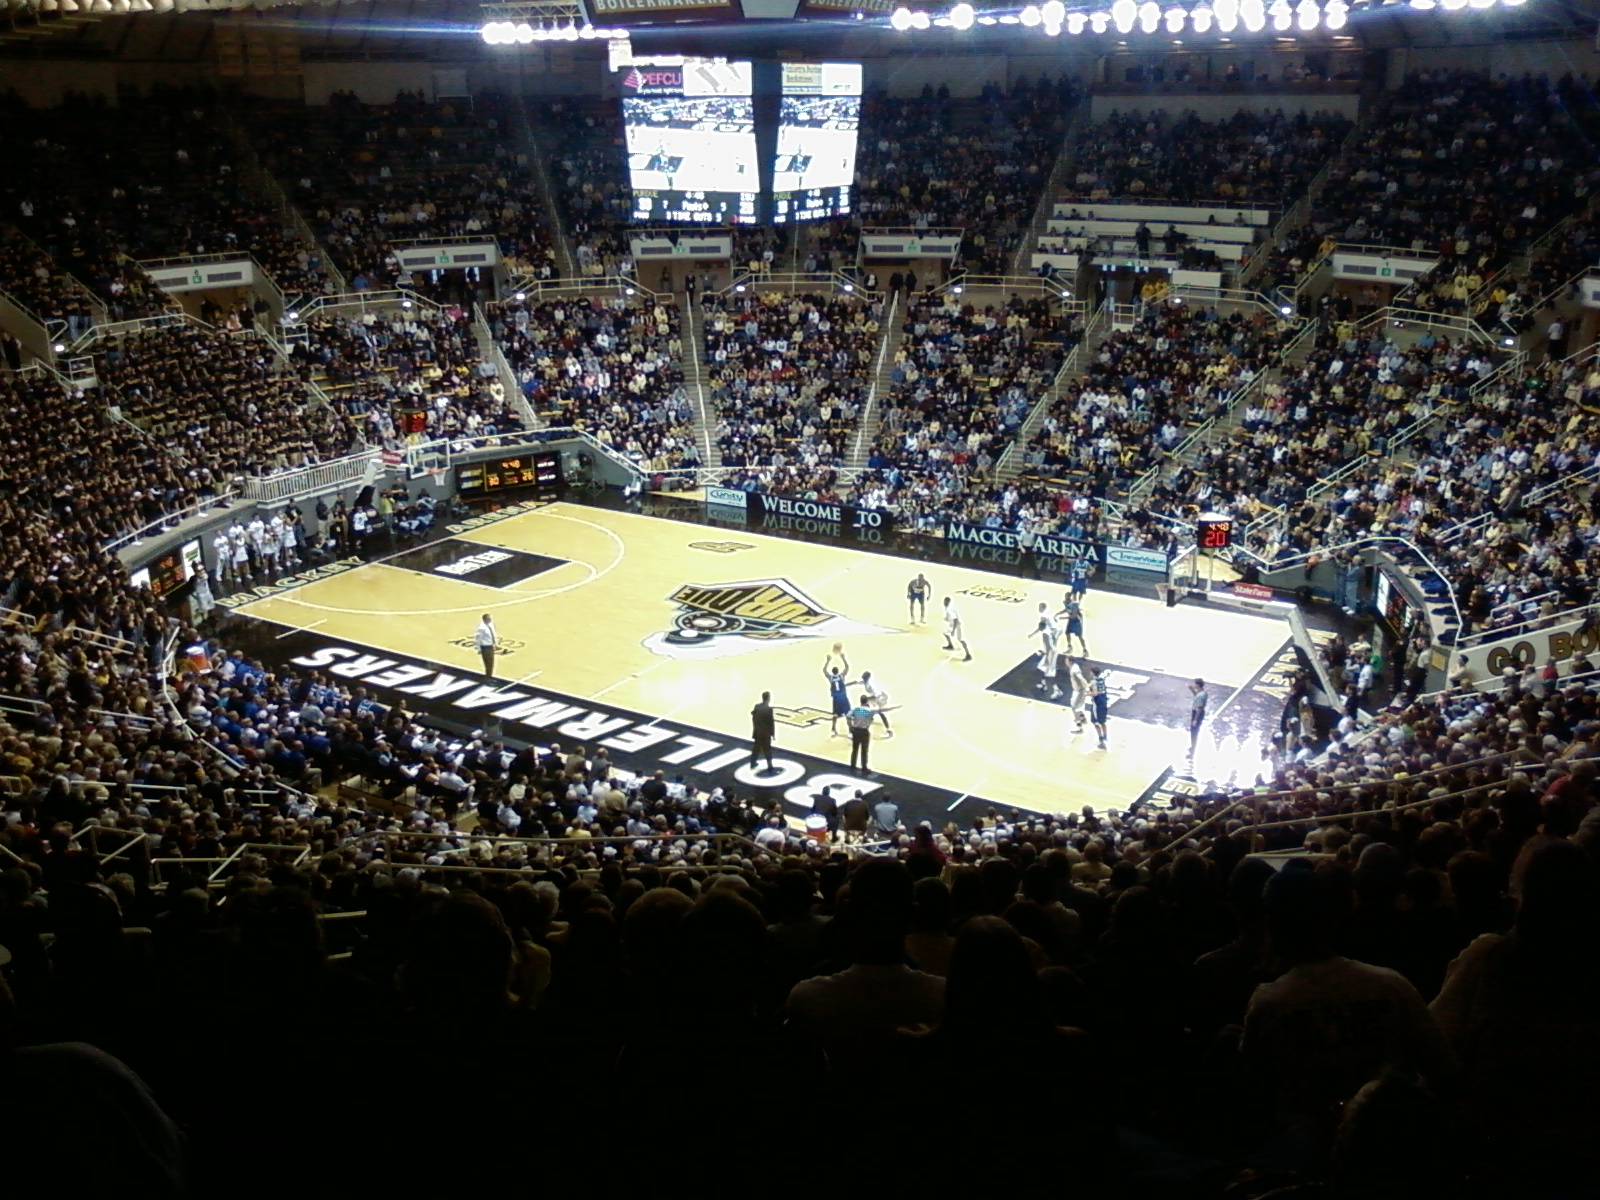 File:Mackey Arena-Purdue vs ISU 2007.jpg